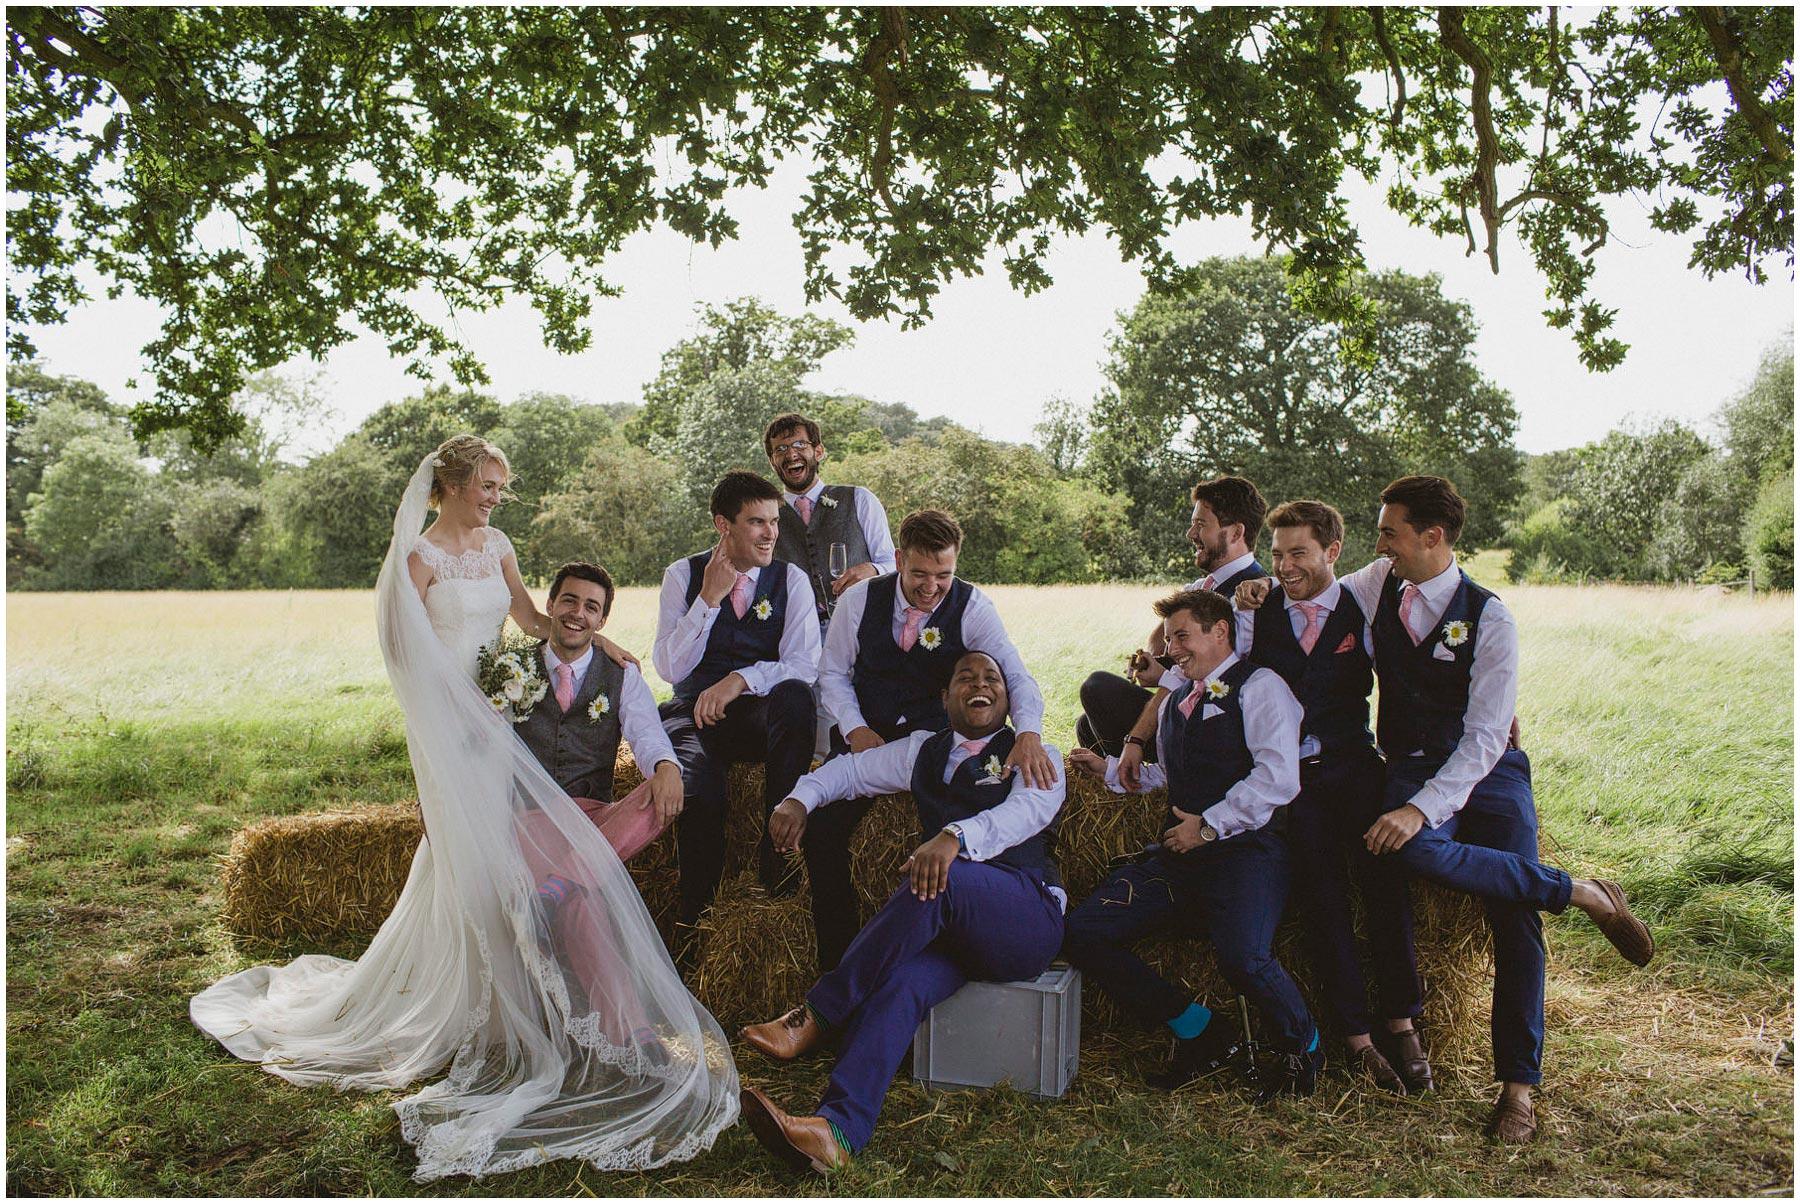 Kent-Festival-Tipi-wedding-photography_0100